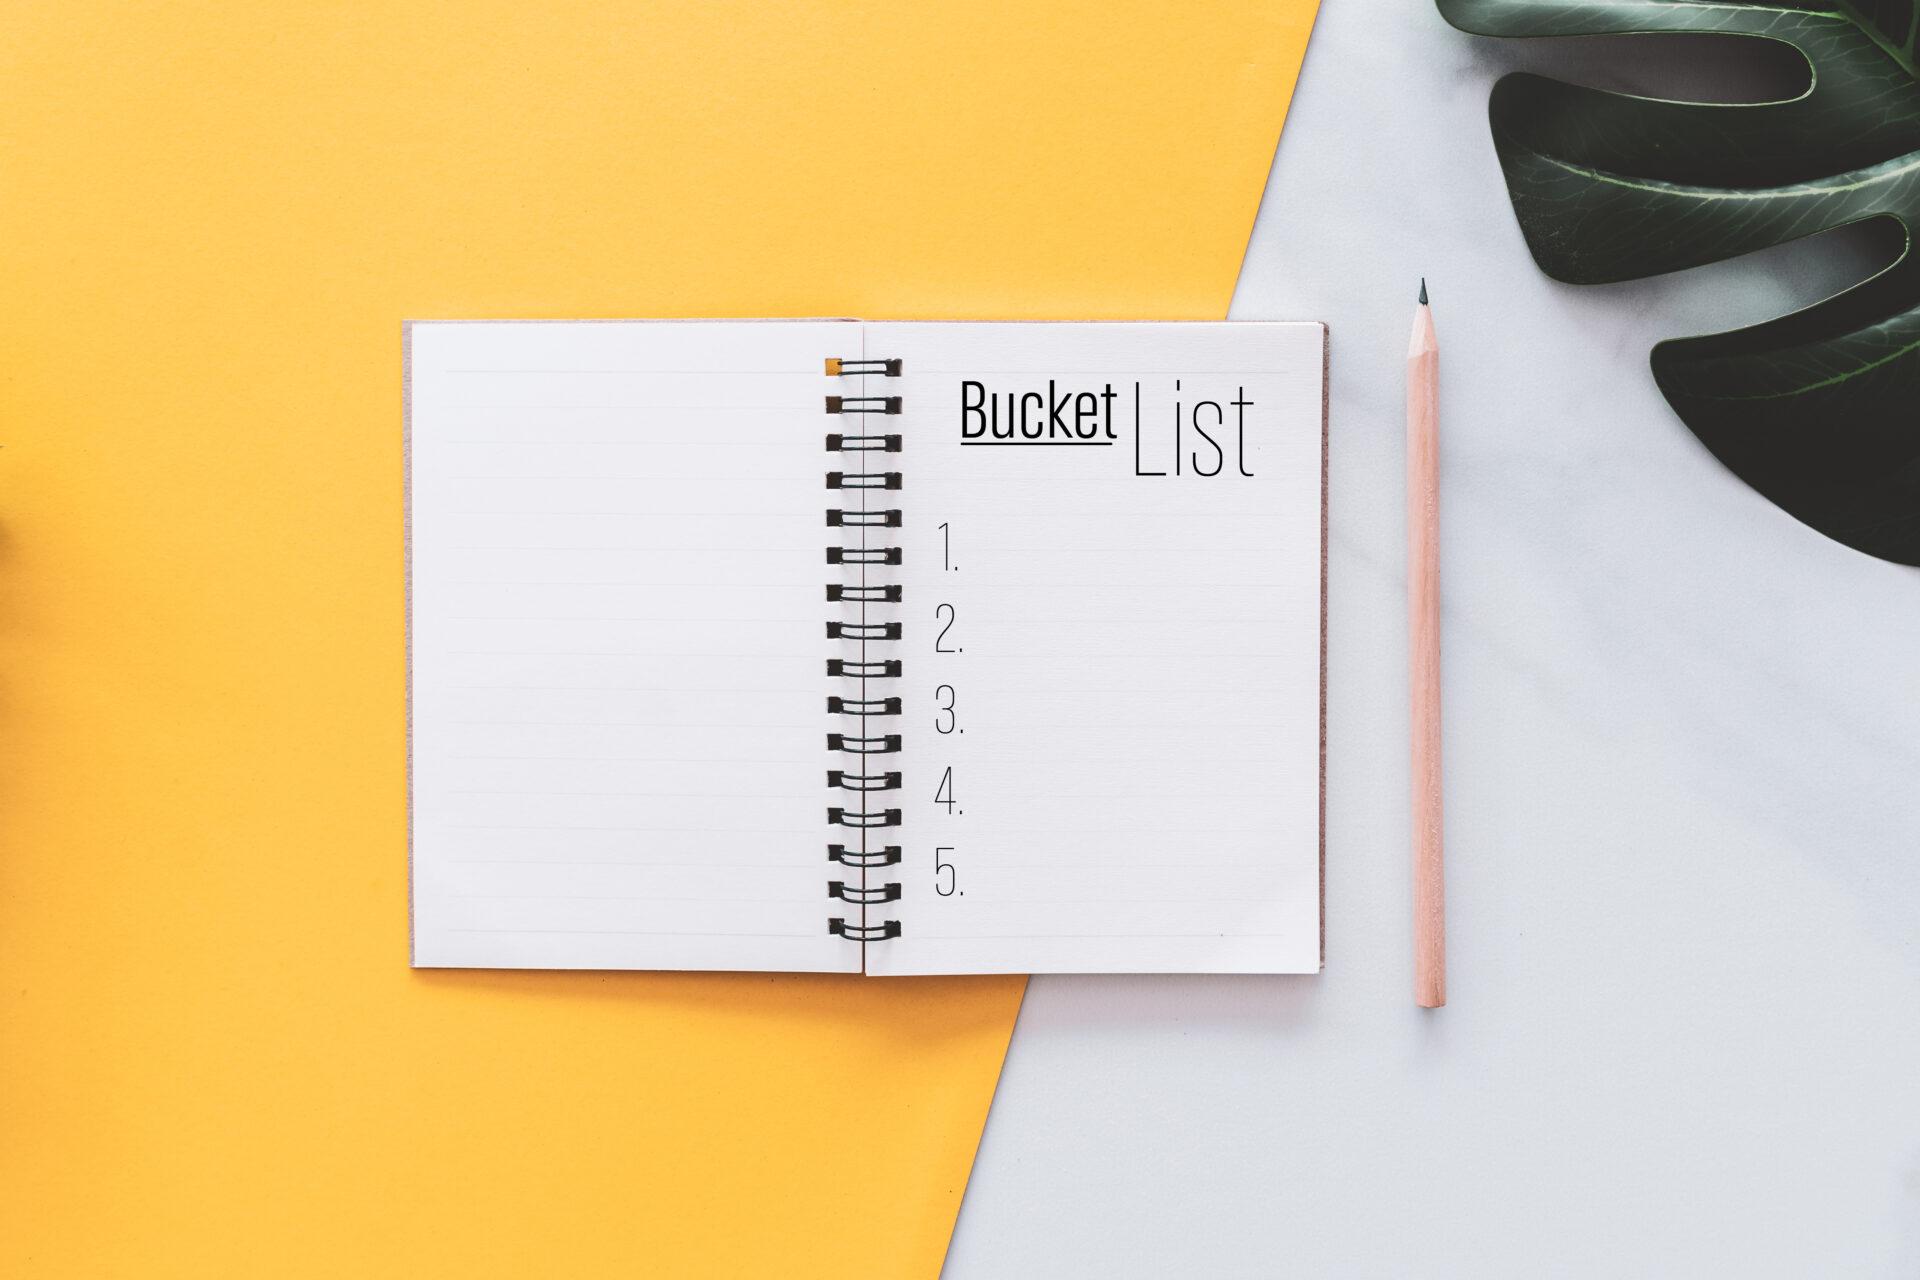 Golf Bucket List